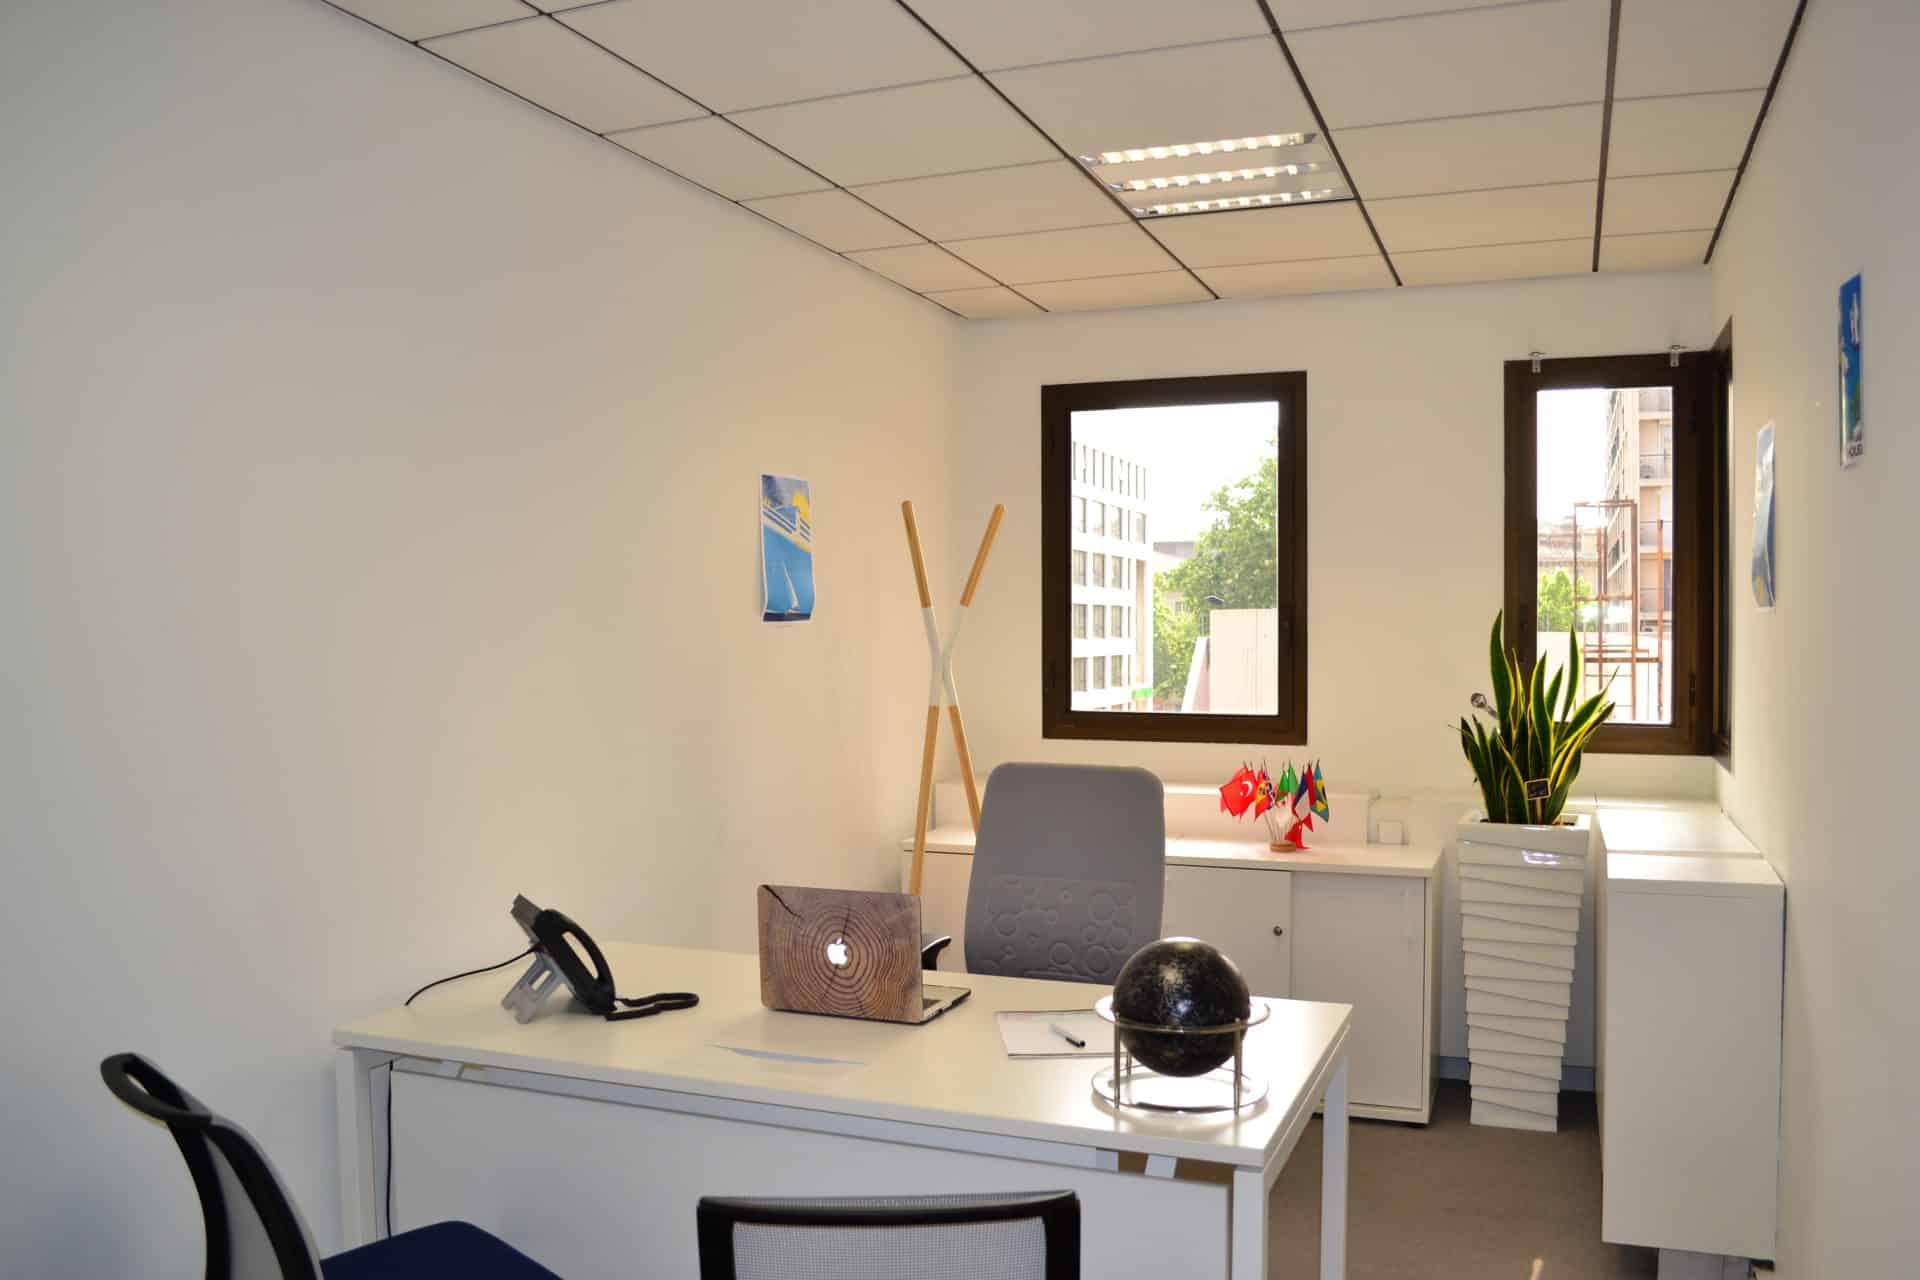 Location de bureau en plein cœur de Marseille - City Center